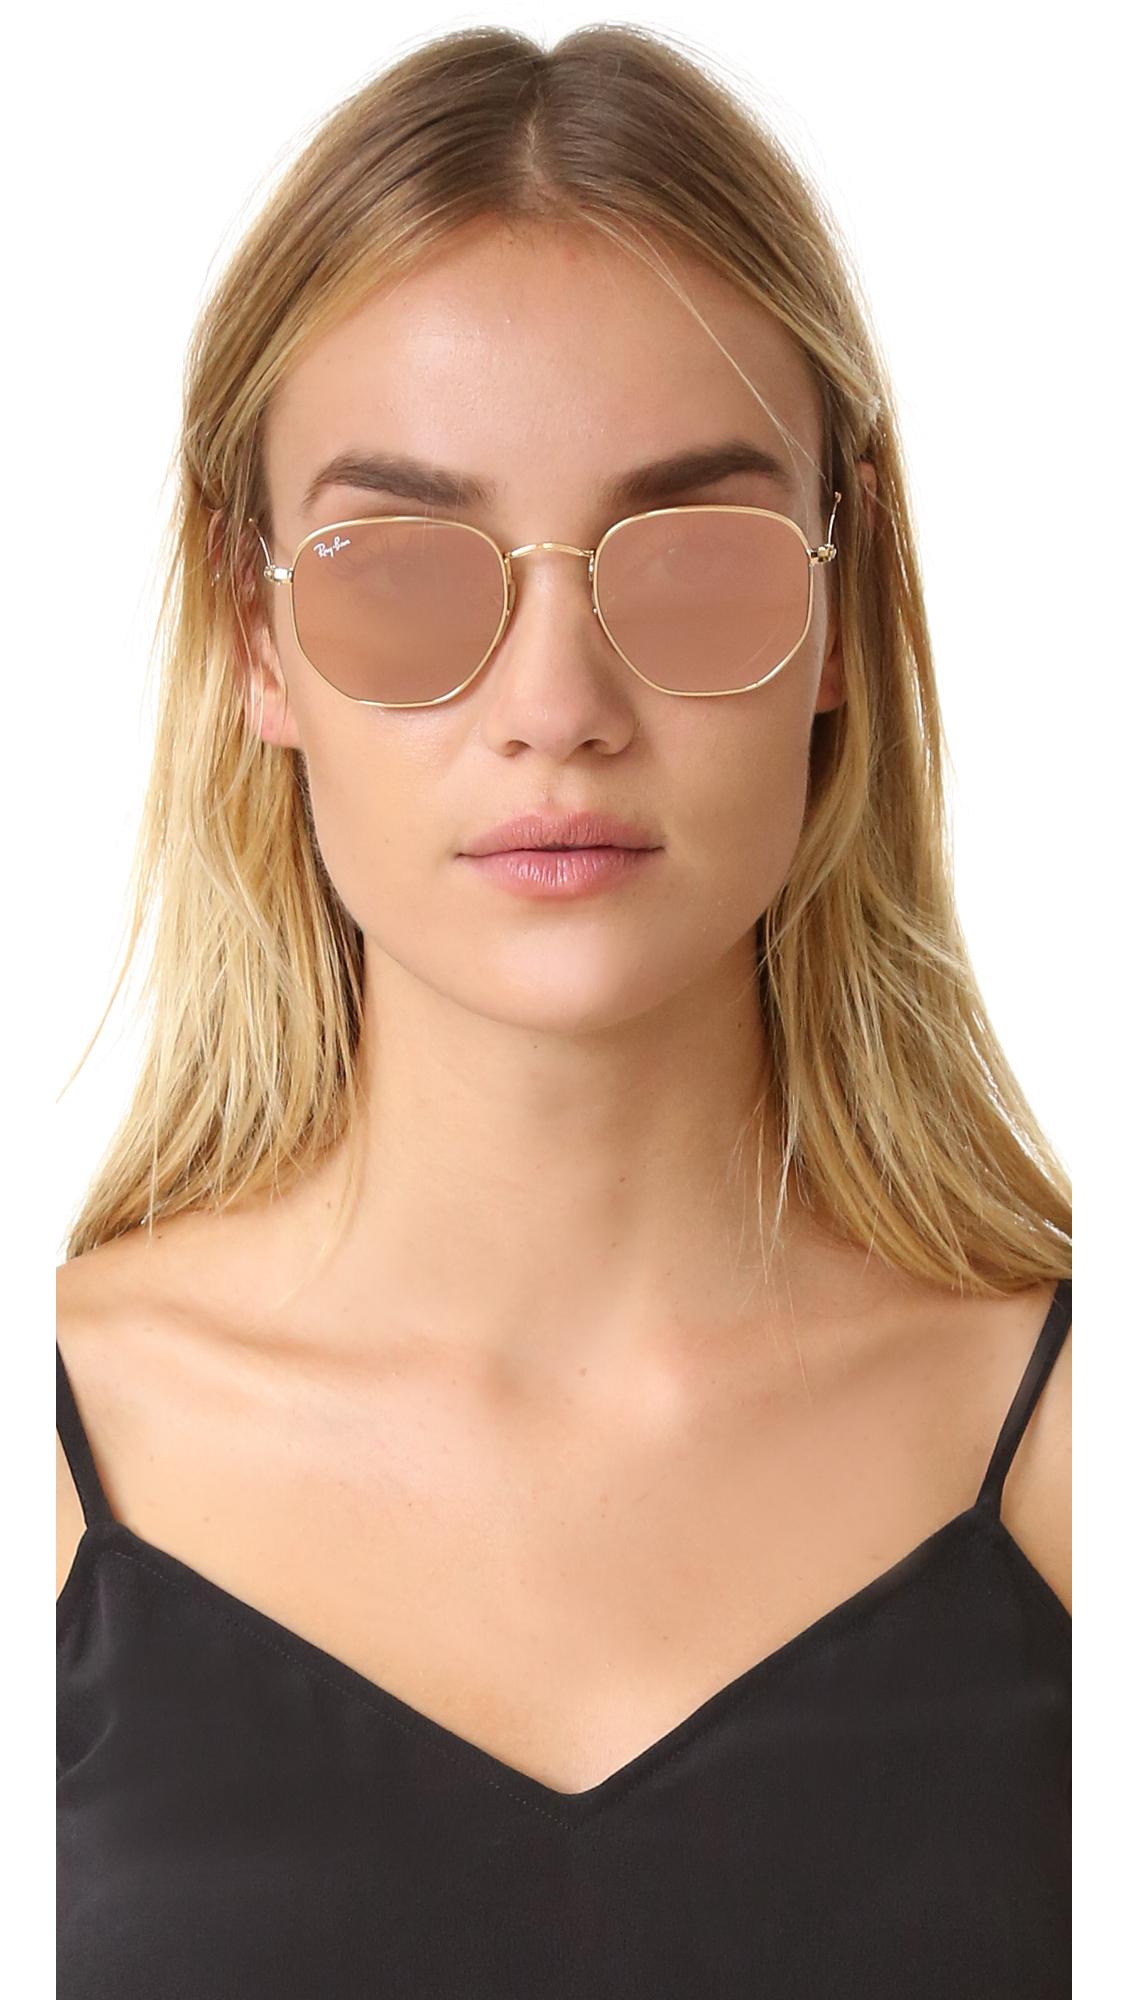 25a56773c9 Ray-Ban RB3548N Hexagonal Mirrored Sunglasses